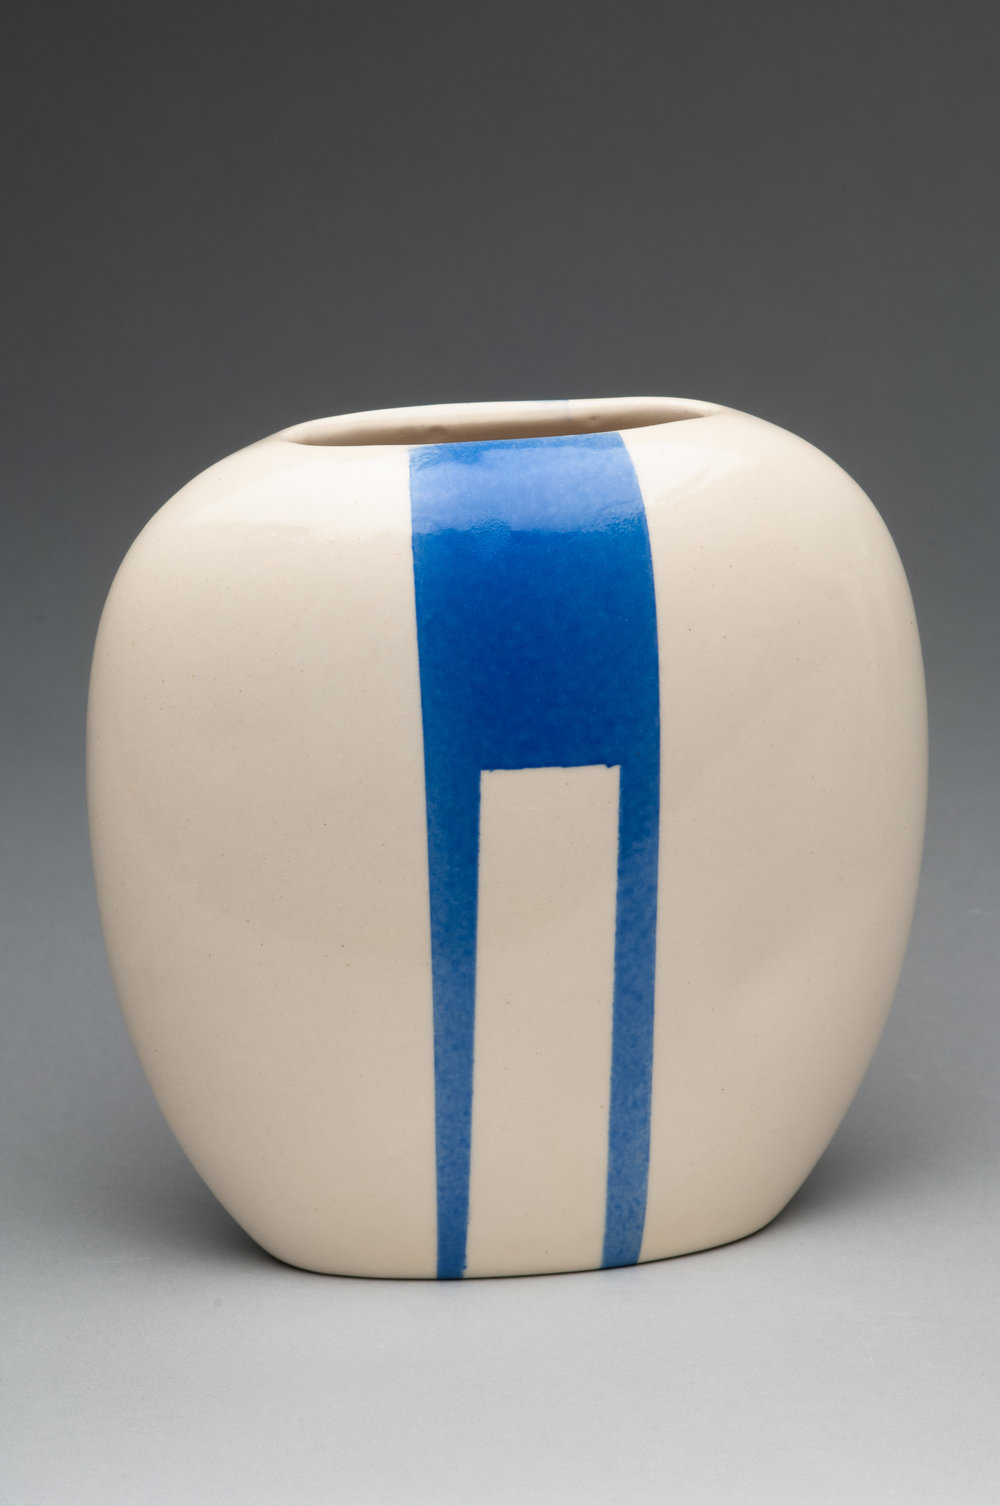 Sm. Oblong Med. Blue Clothespin